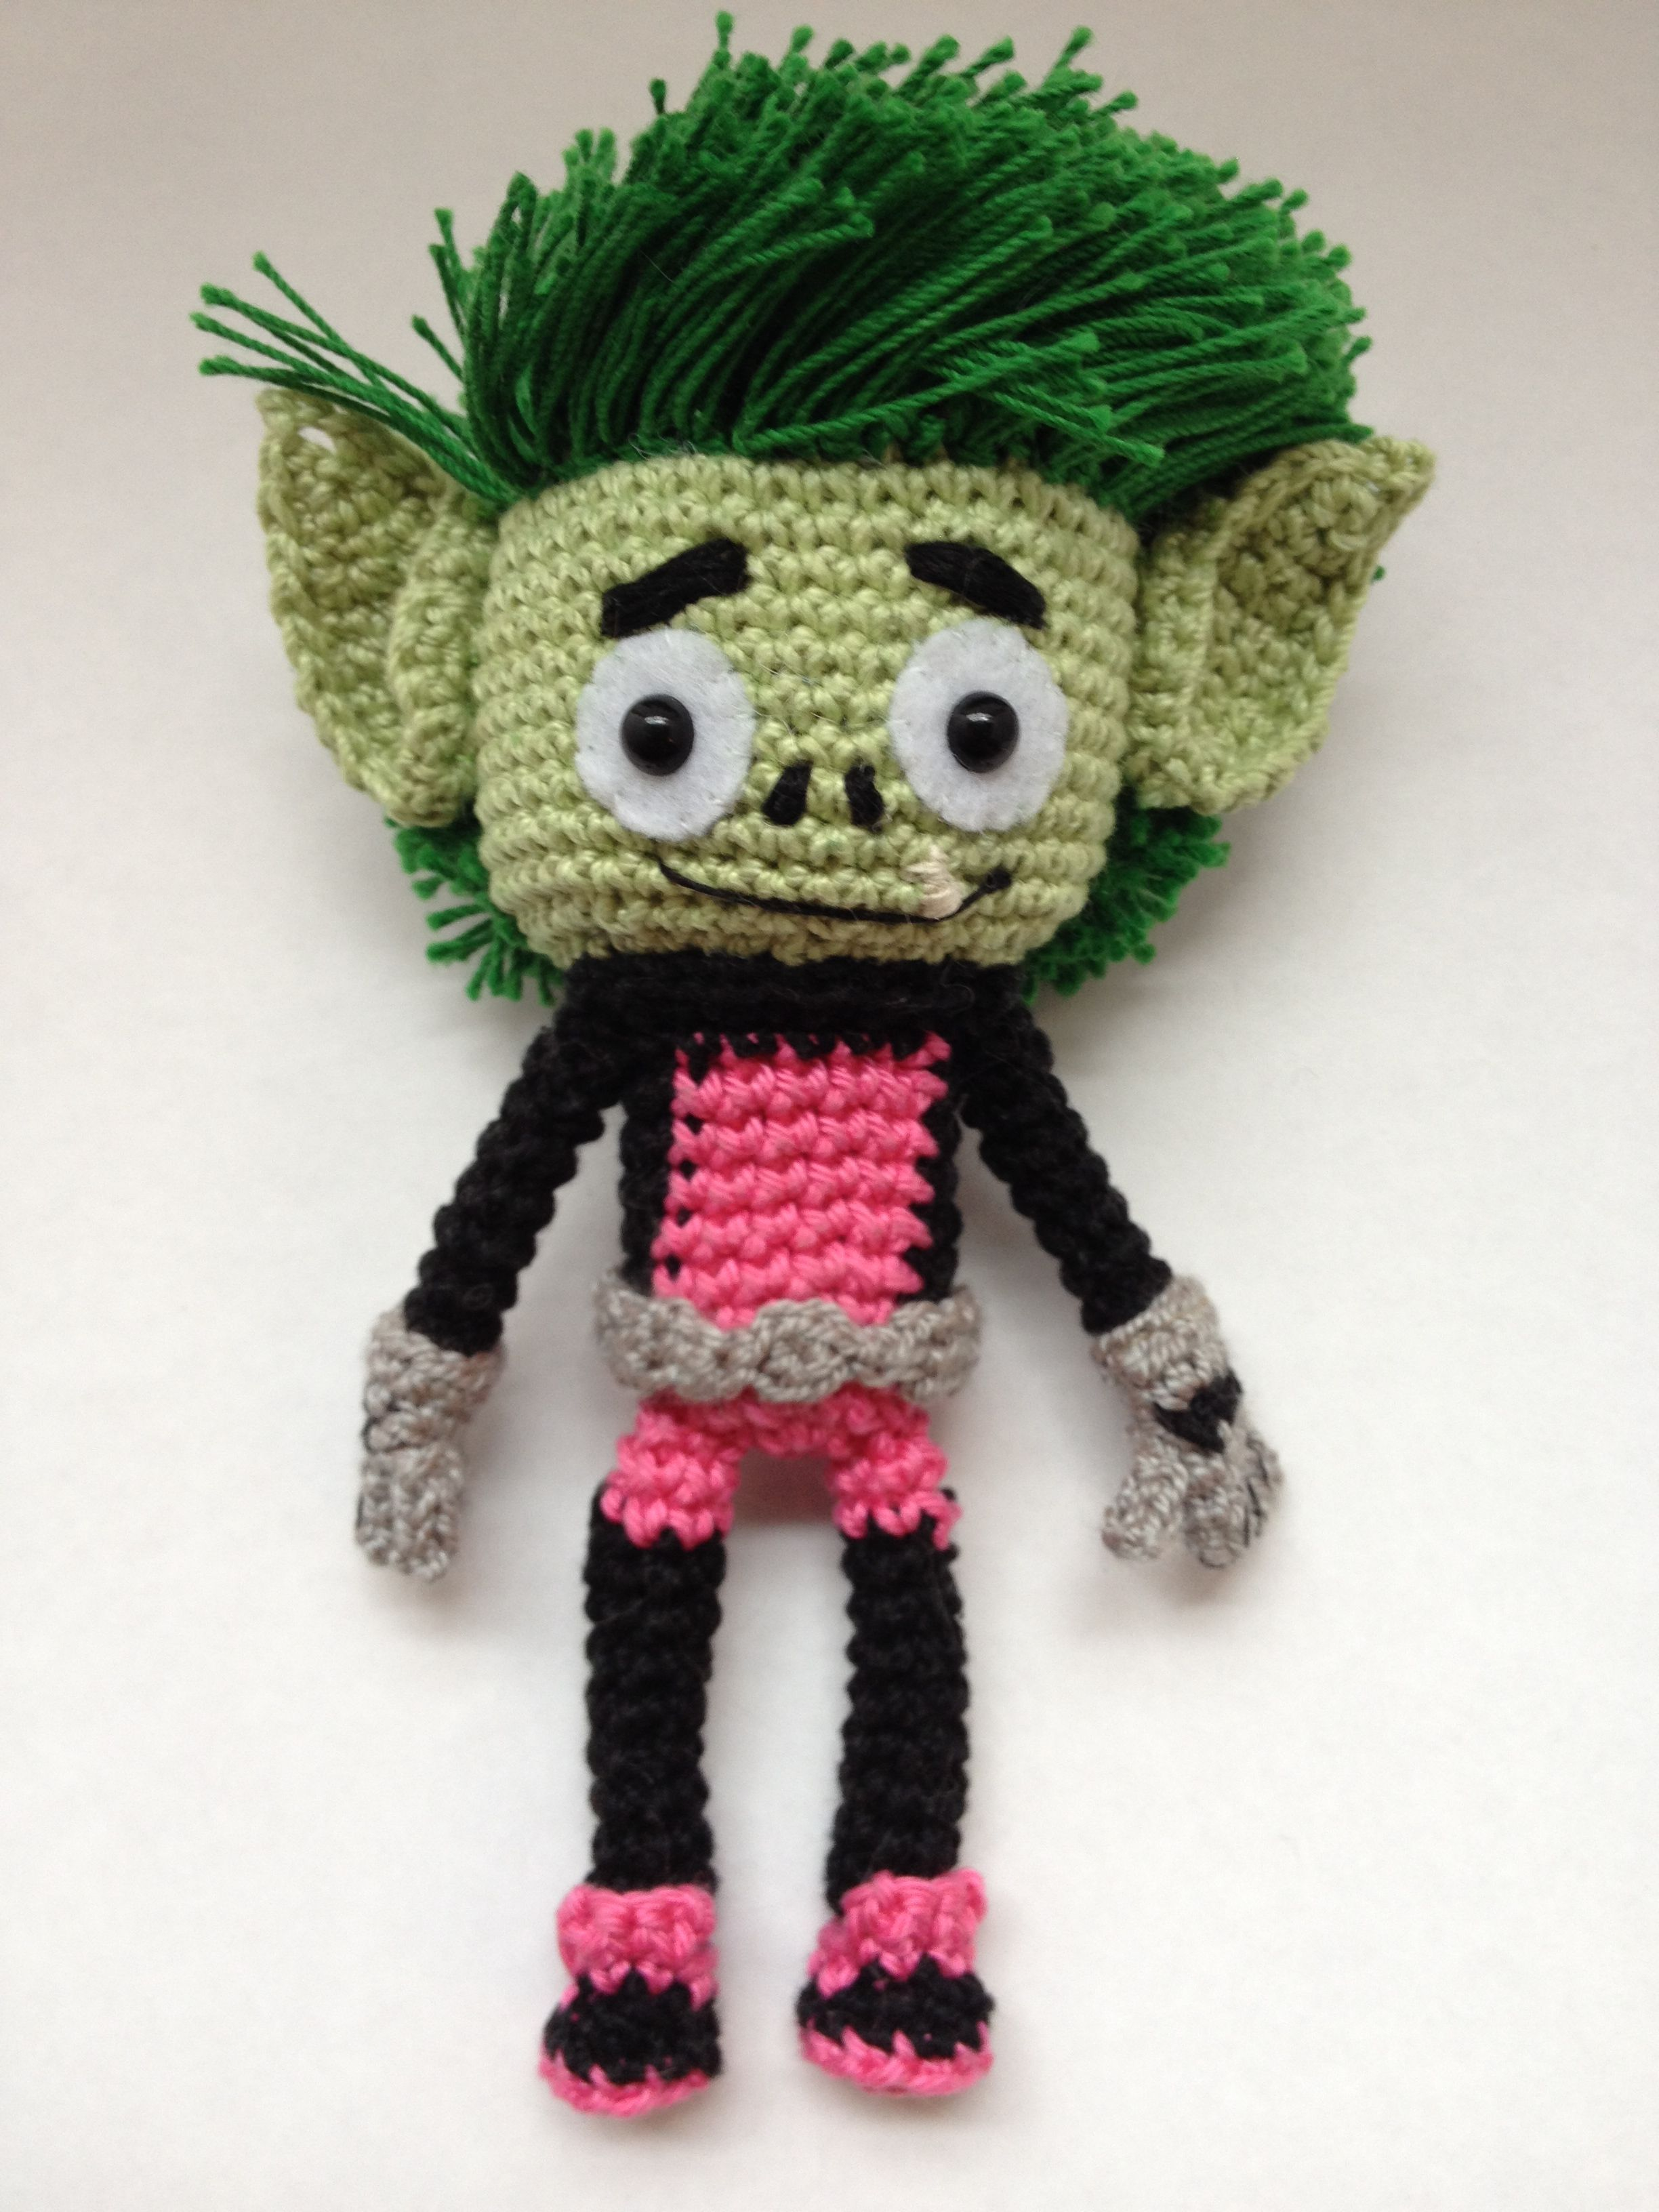 Beast Boy With Images Crochet Crochet Projects Crochet Dolls